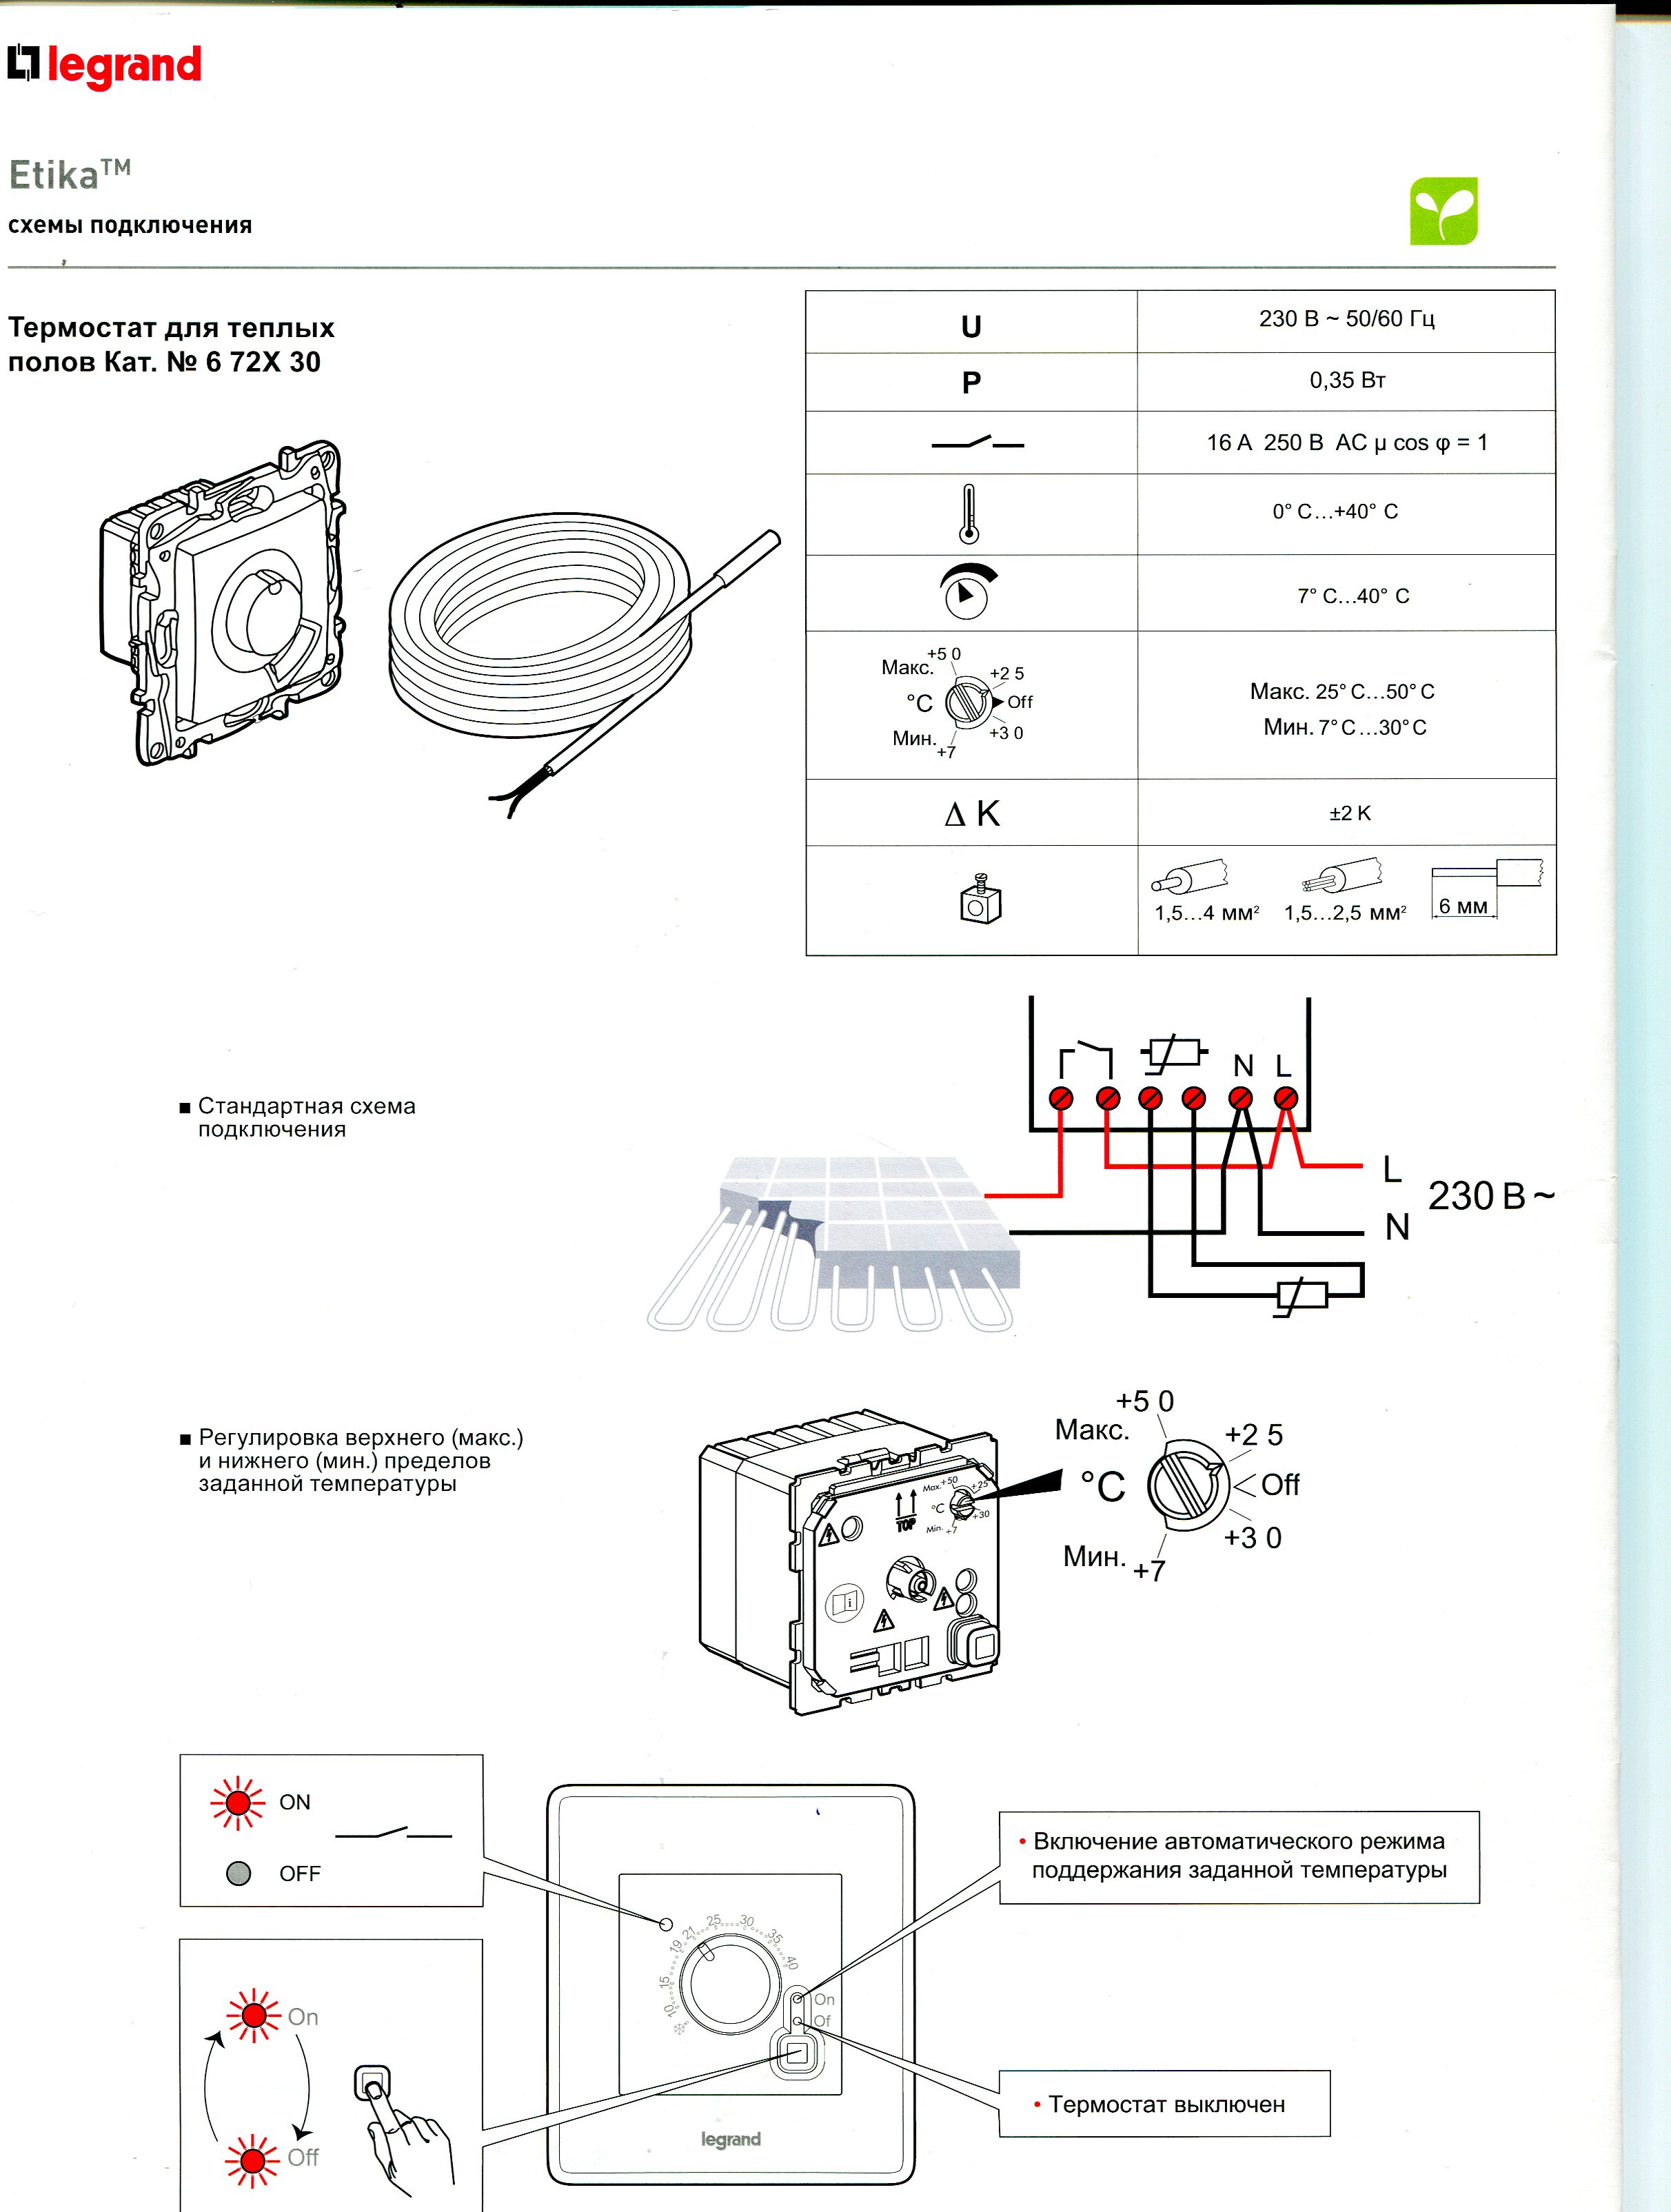 Схема подключения терморегулятор для теплого пола legrand